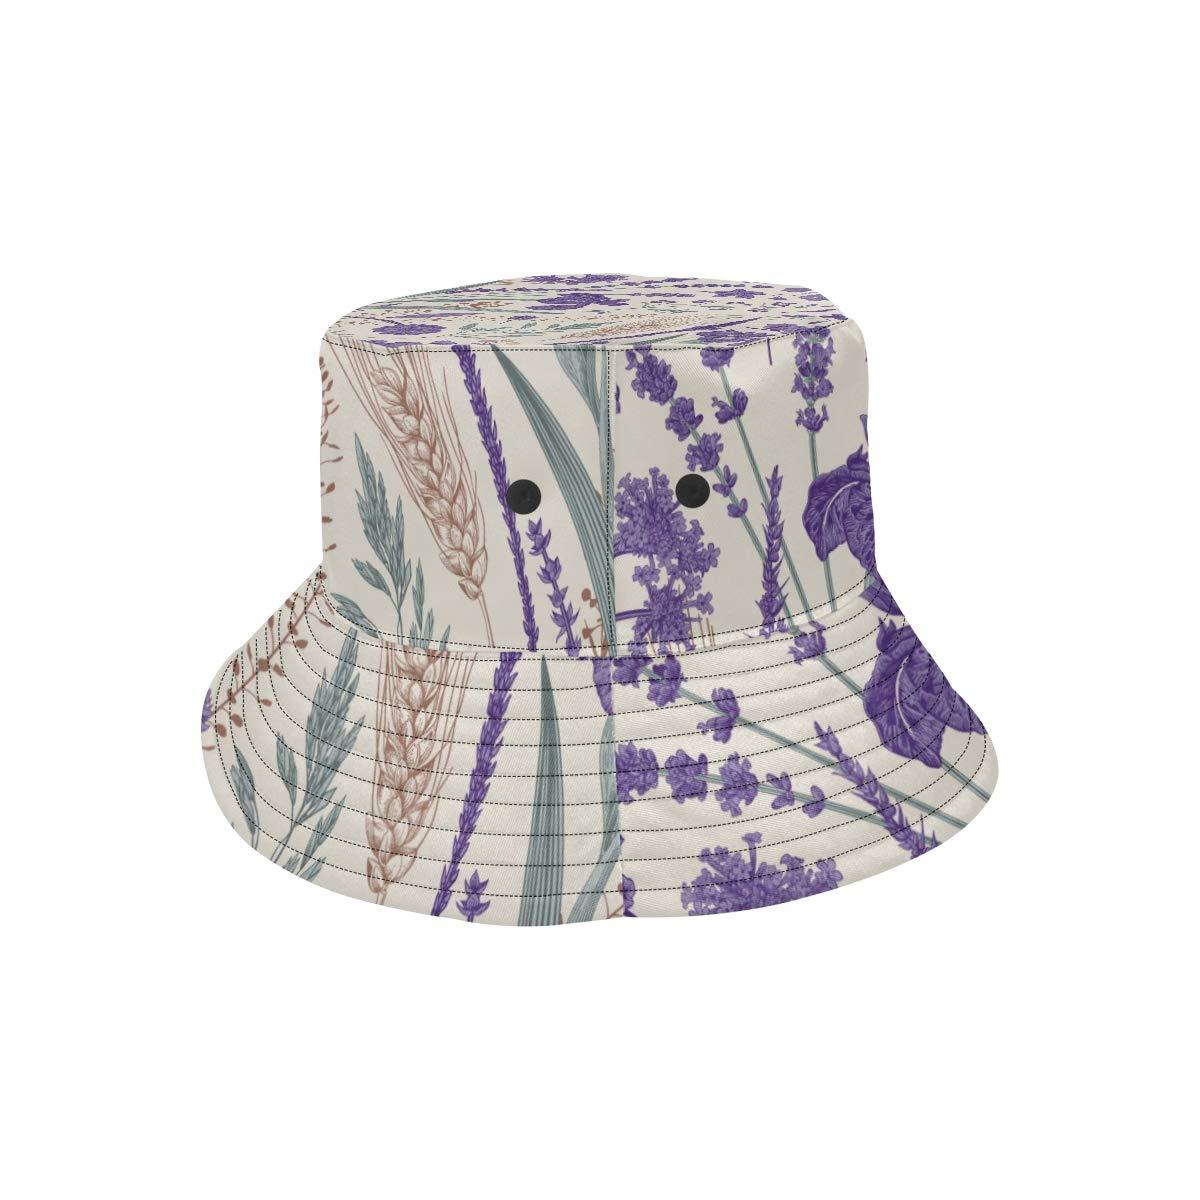 Aconite Purple Flower Summer Unisex Fishing Sun Top Bucket Hats for Kid Teens Women and Men with Packable Fisherman Cap for Outdoor Baseball Sport Picnic